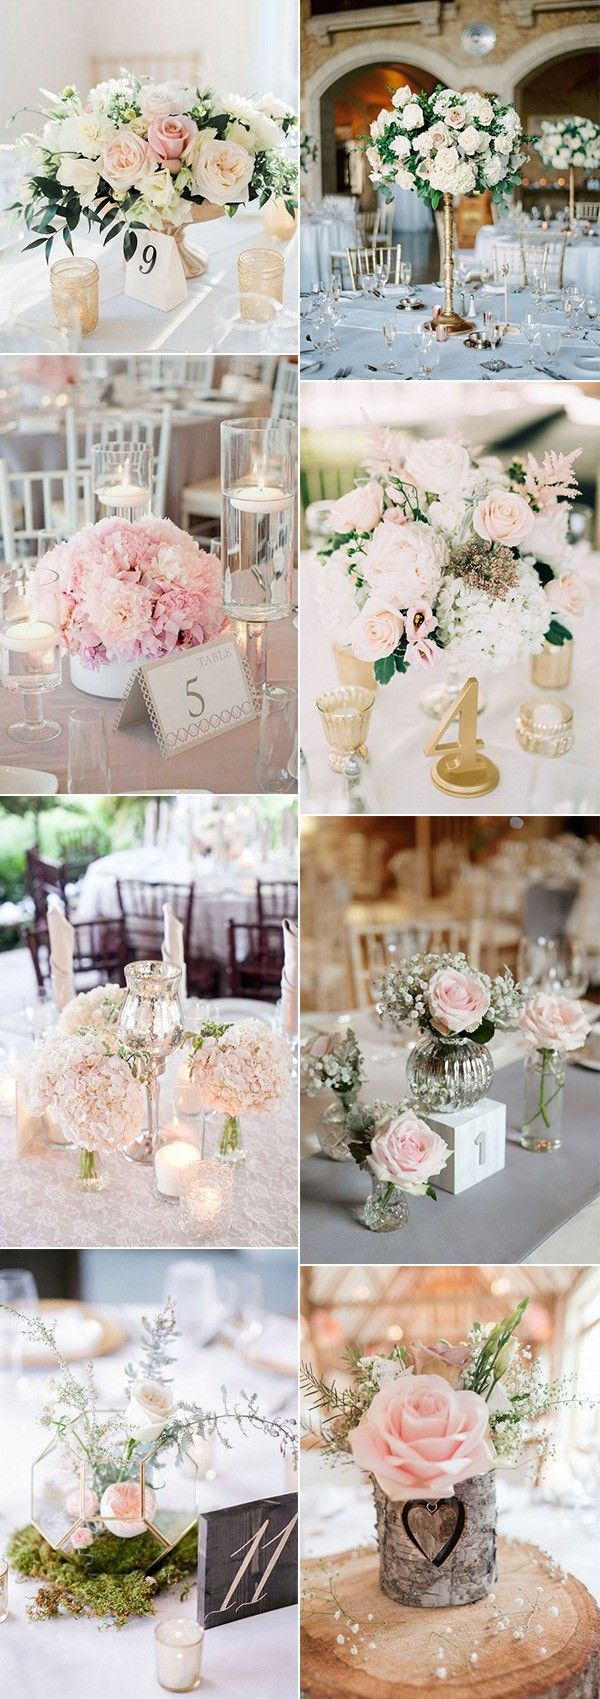 Wedding decorations on tables   Elegant Blush Wedding Centerpieces for Your Big Day  Wedding